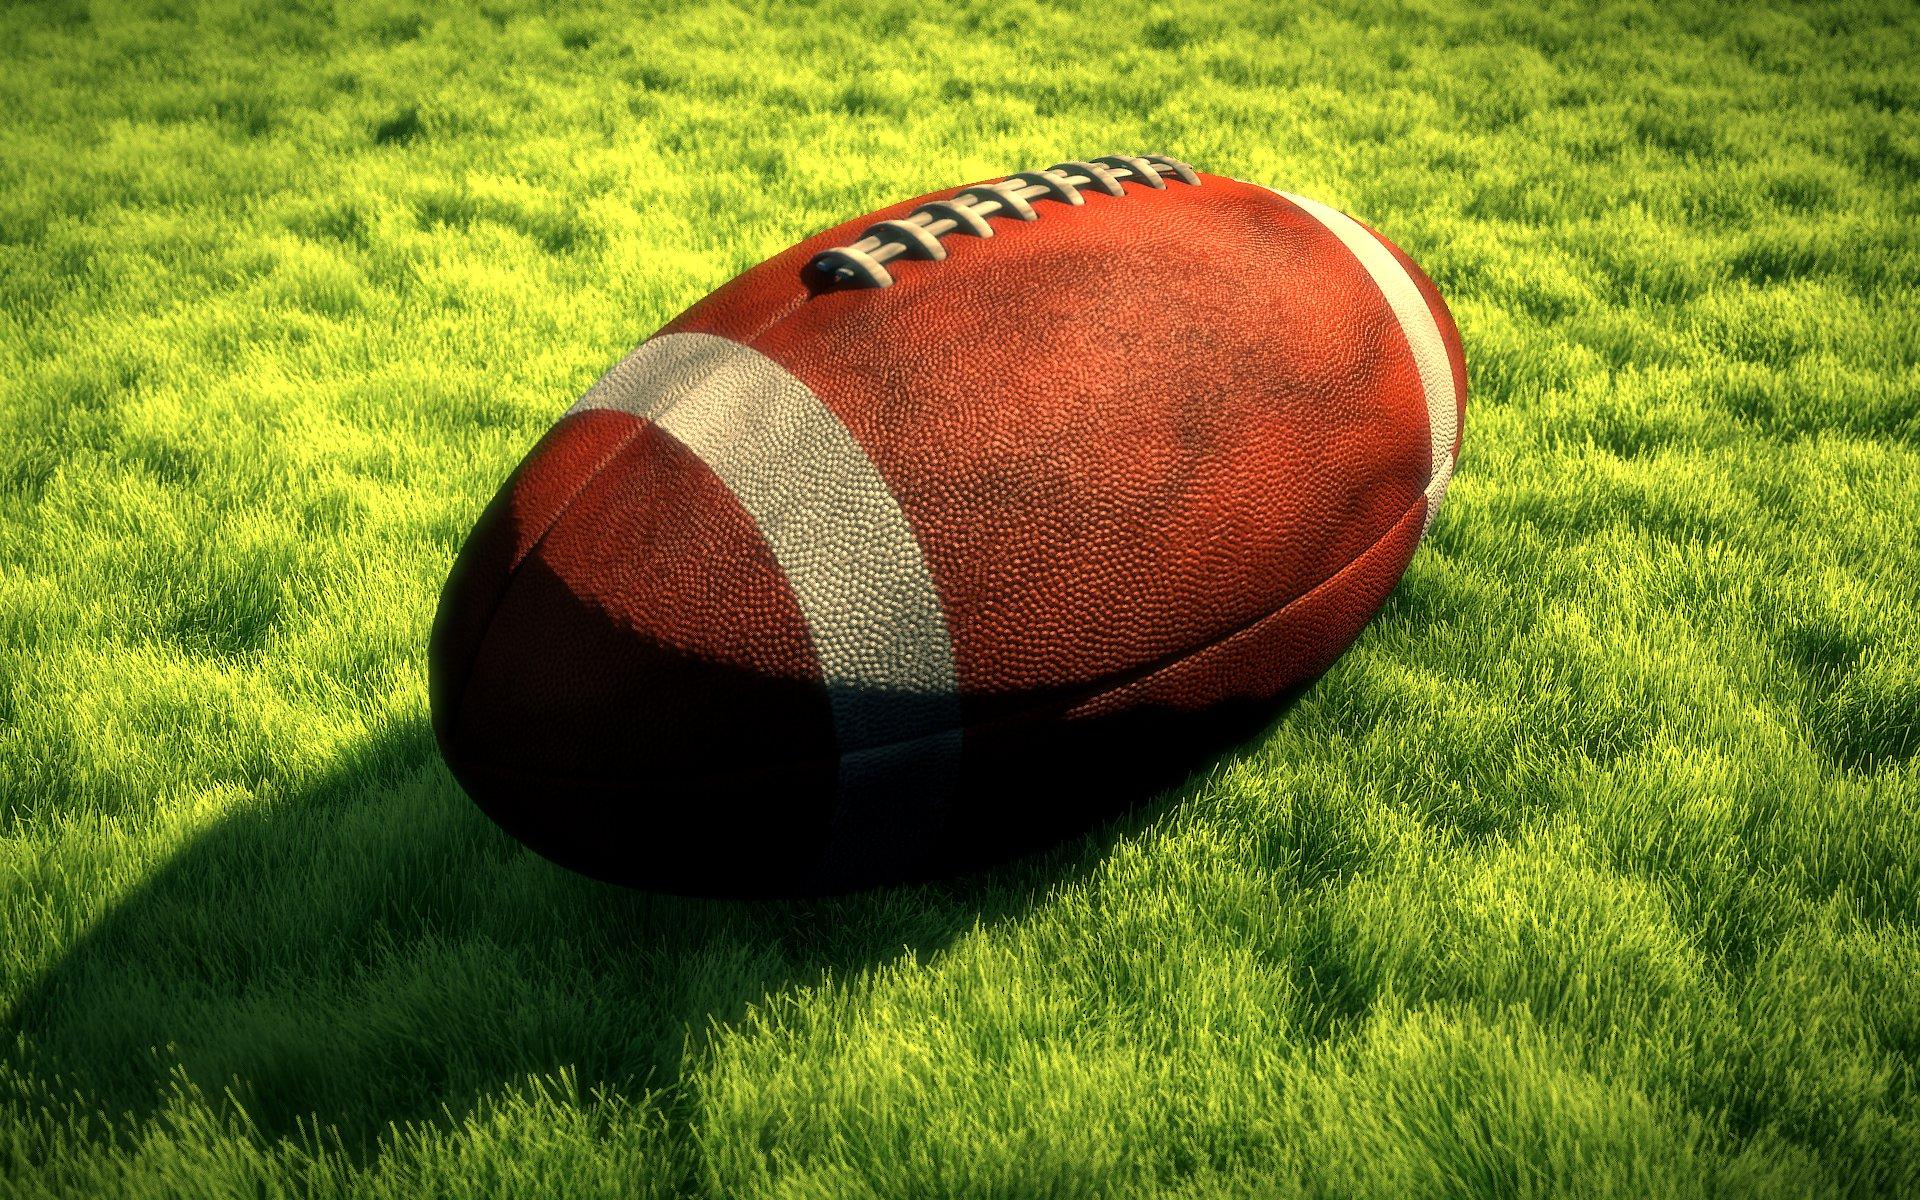 Nfl Football Field Wallpaper Nfl american football ball on 1920x1200